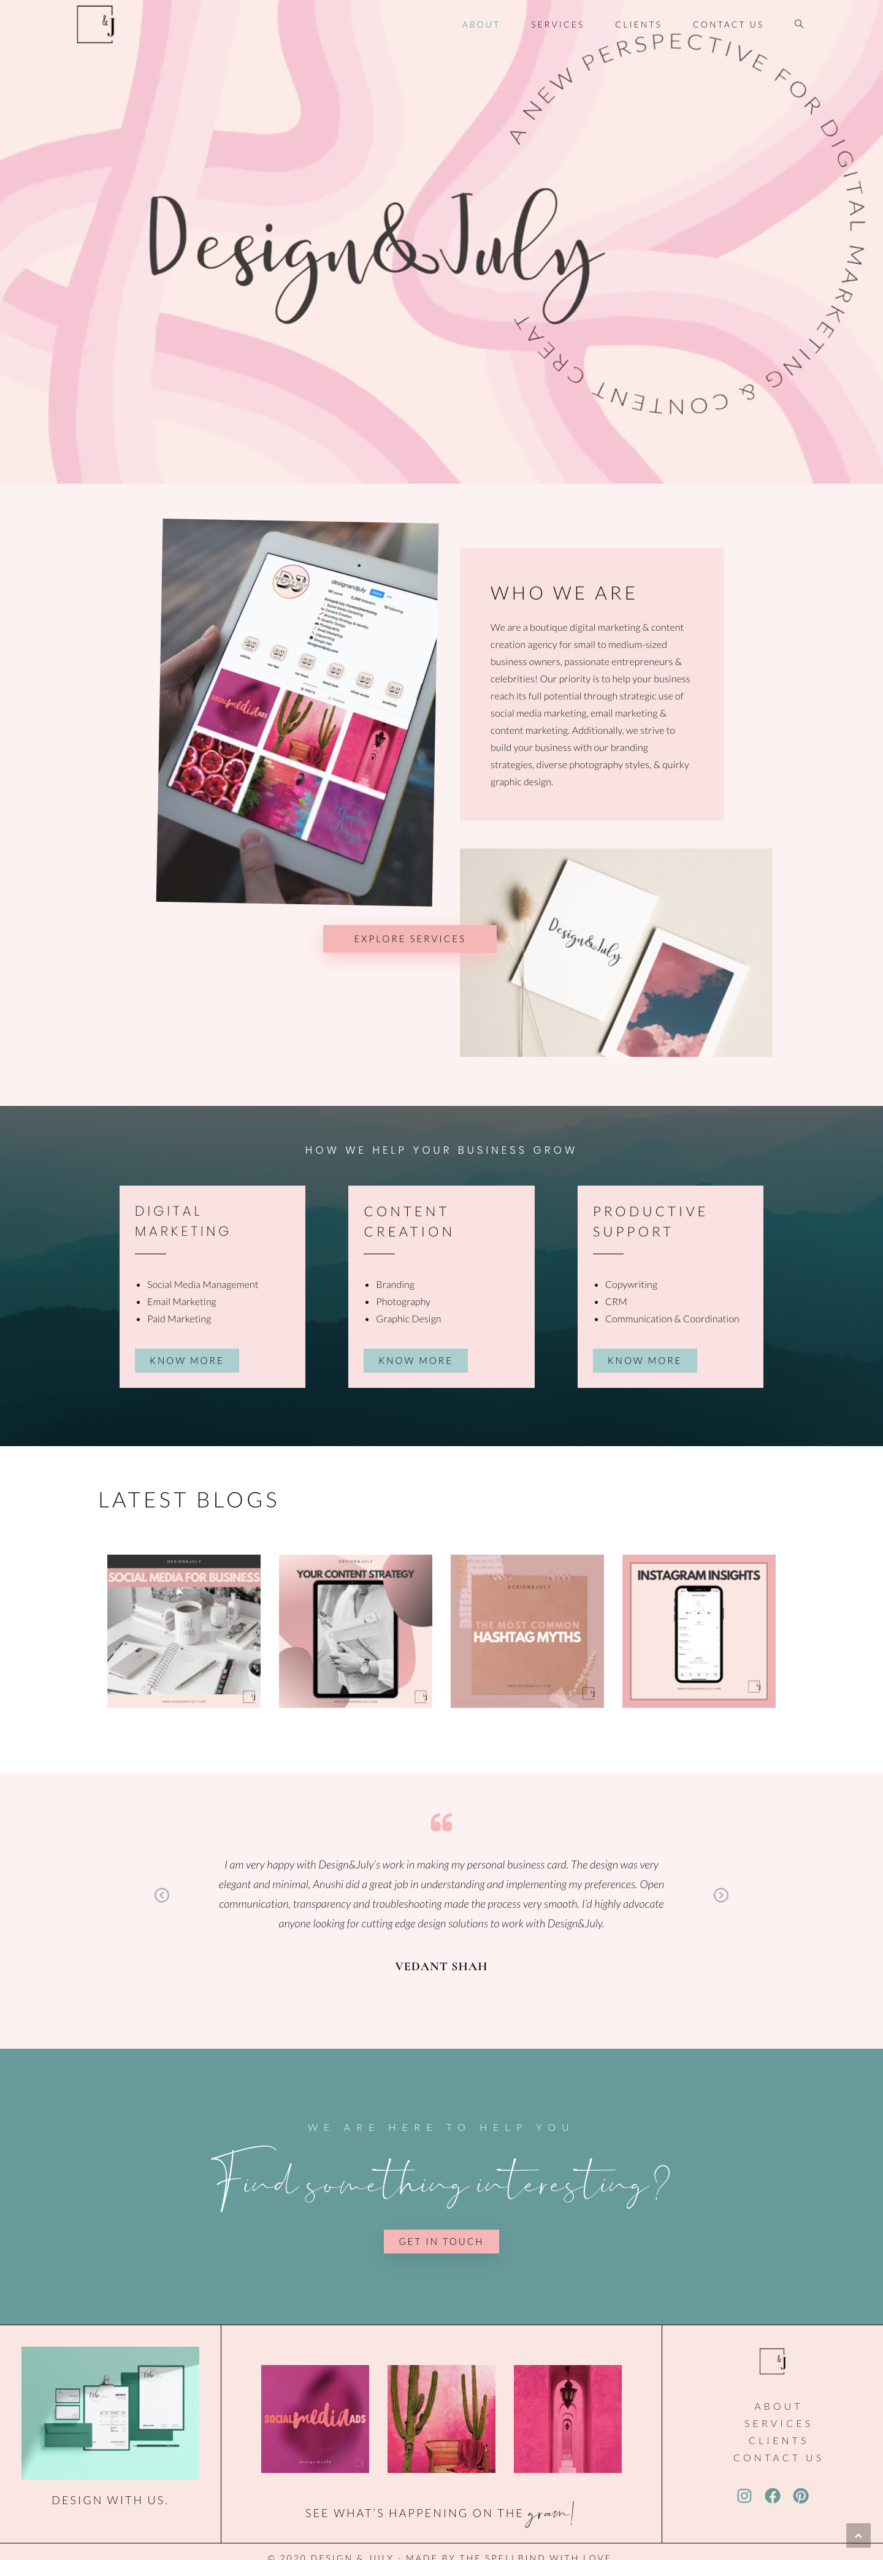 Design & July - Website Design & Branding 3